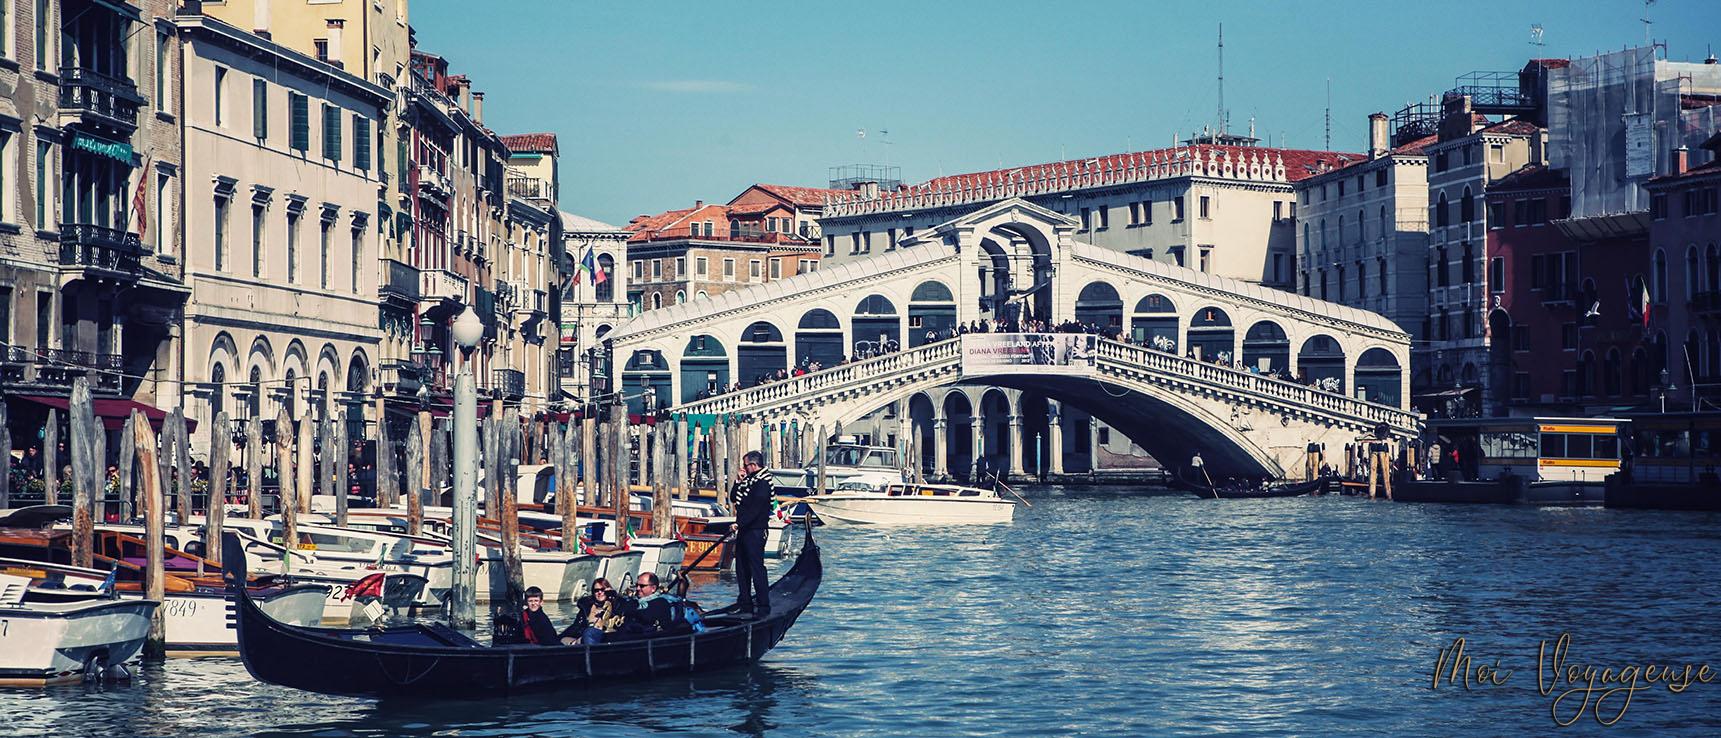 Grand Canal de Venise Italie Europe Rialto Gondole